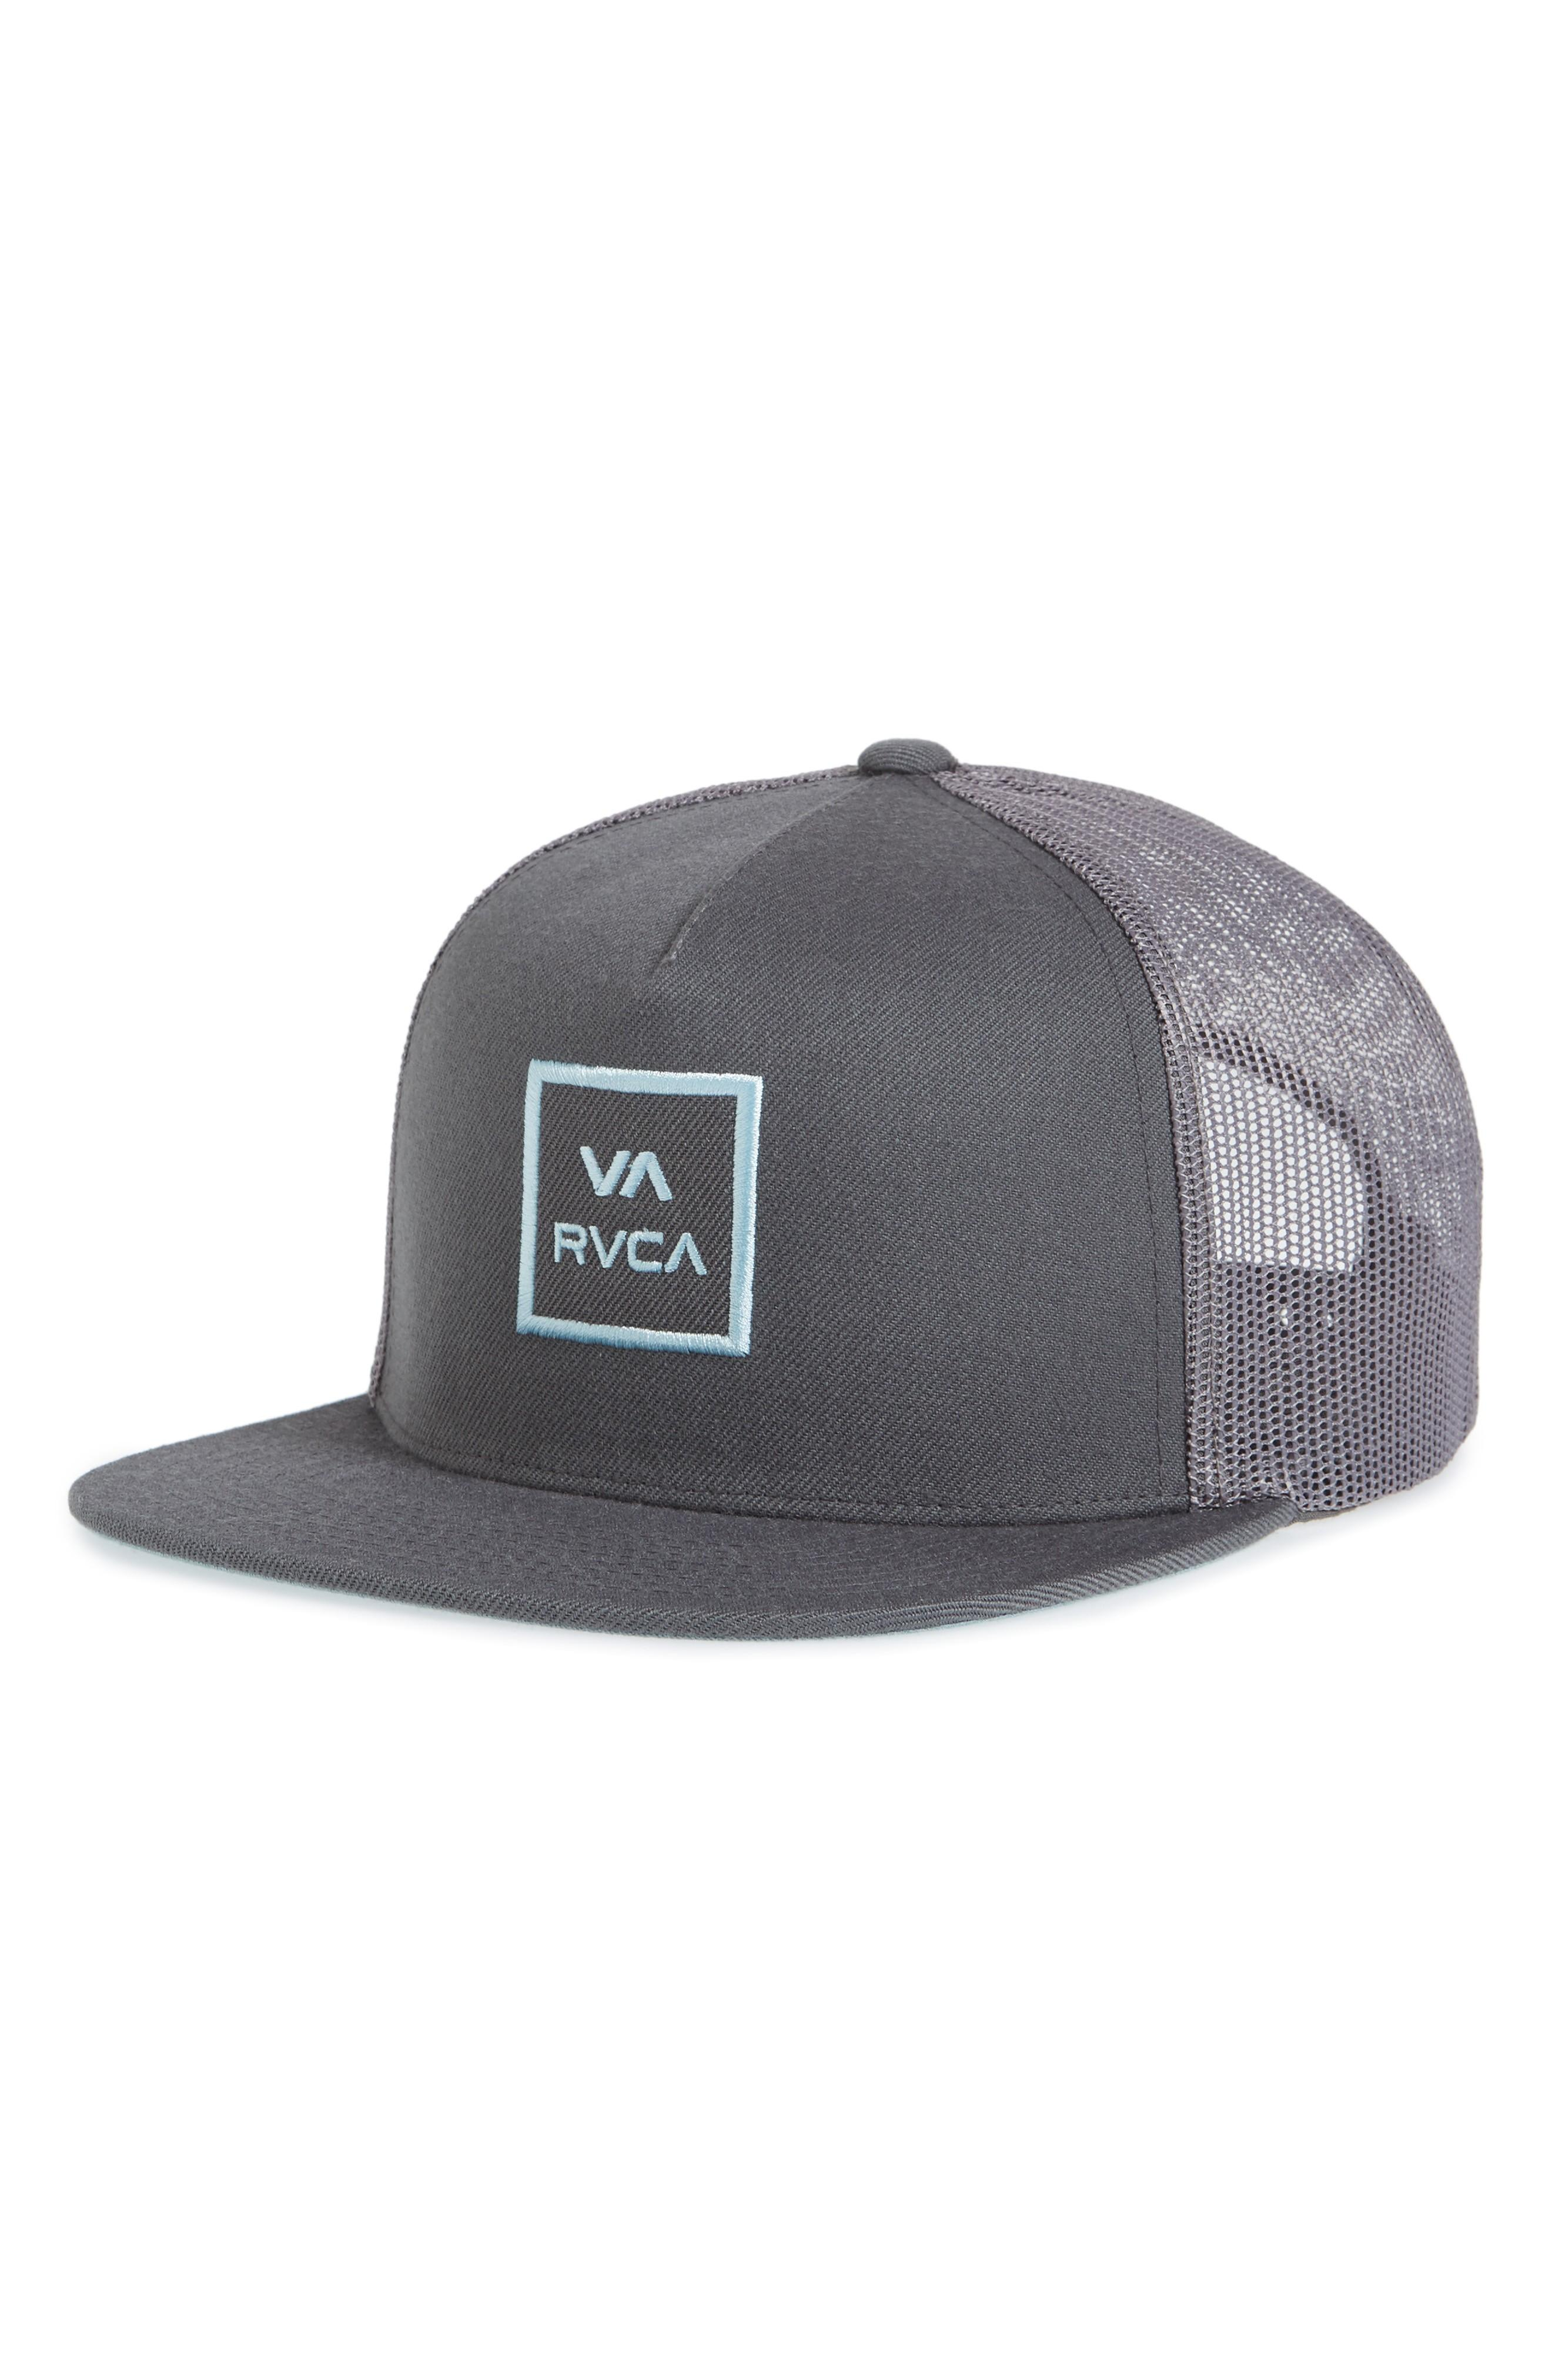 low priced 0cfec 55f35 Rvca Va All The Way Trucker Hat - Grey In Dark Grey